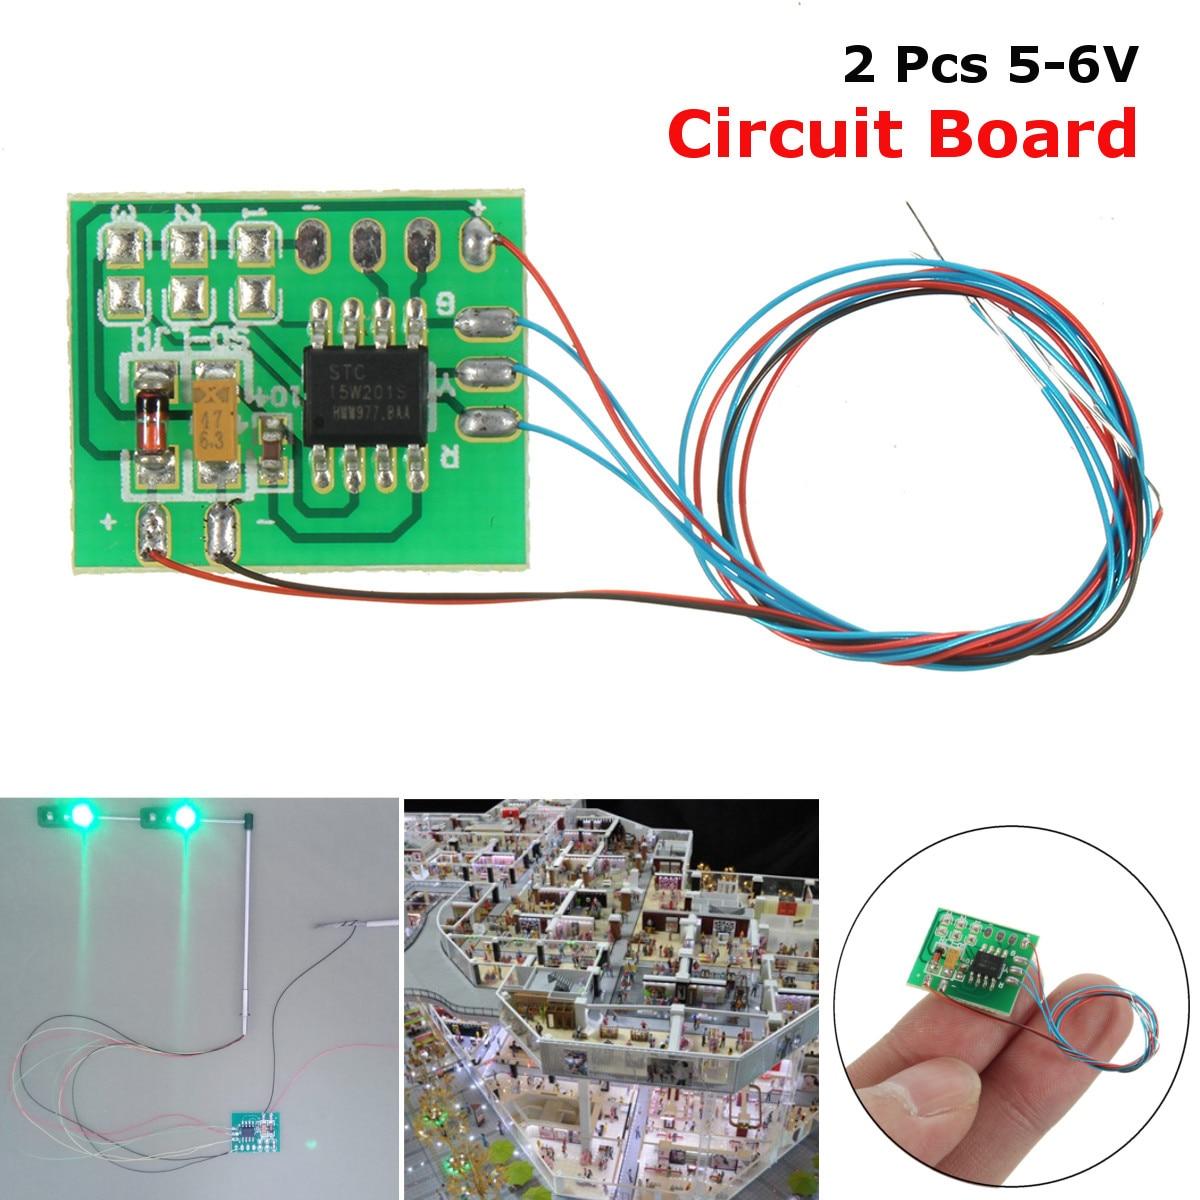 3pcs 60mm Model 3 Light Metal Traffic Signal Lights 5 6v 0 36w Power Led Circuit 2pcs Diy Scale Construction Sand Table Board Ho Train